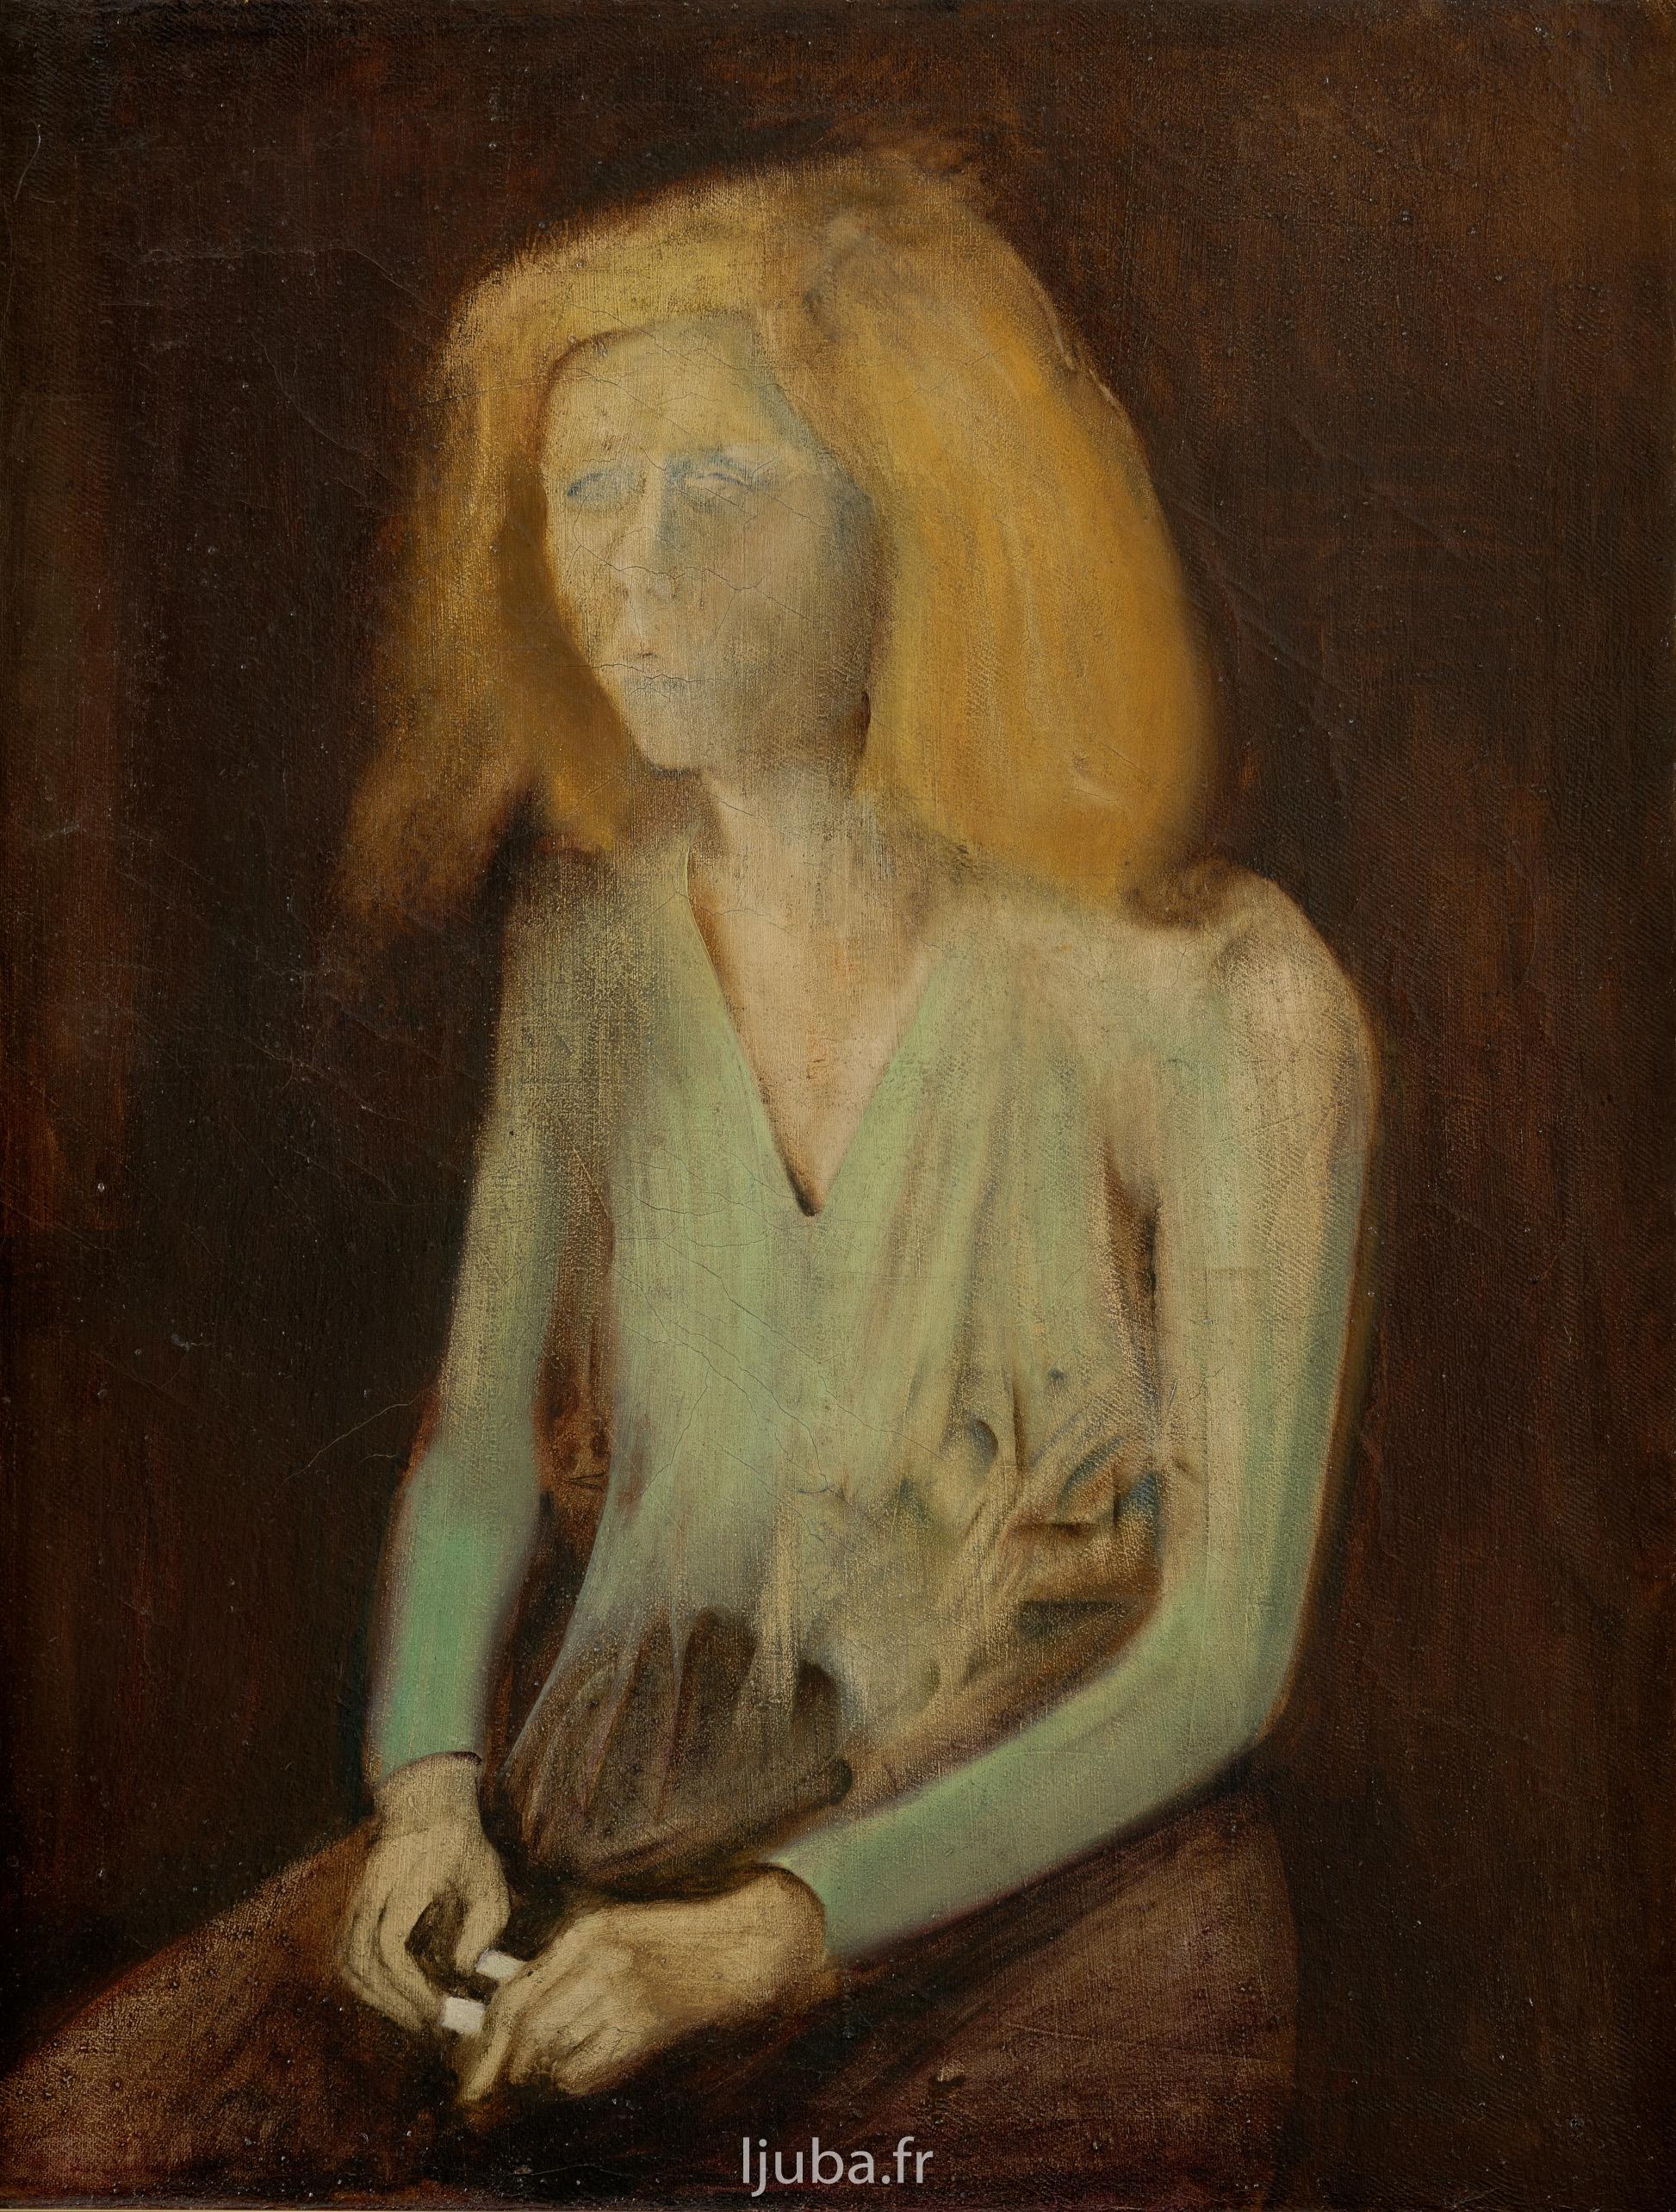 Ljuba Popovic - 1957, Le Personnage jaune